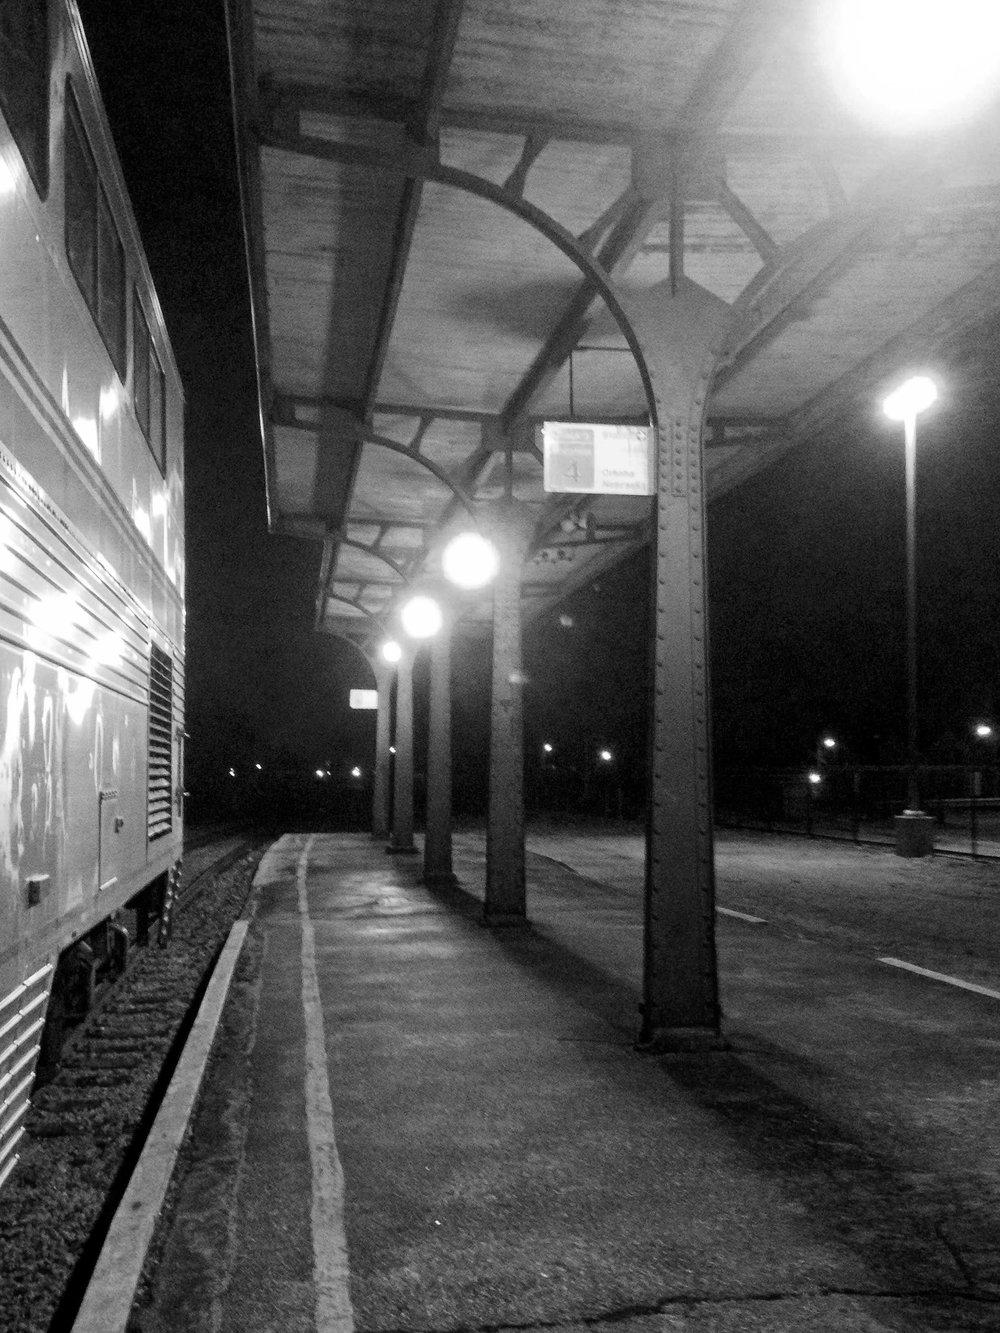 A nighttime stop in Omaha, Nebraska.